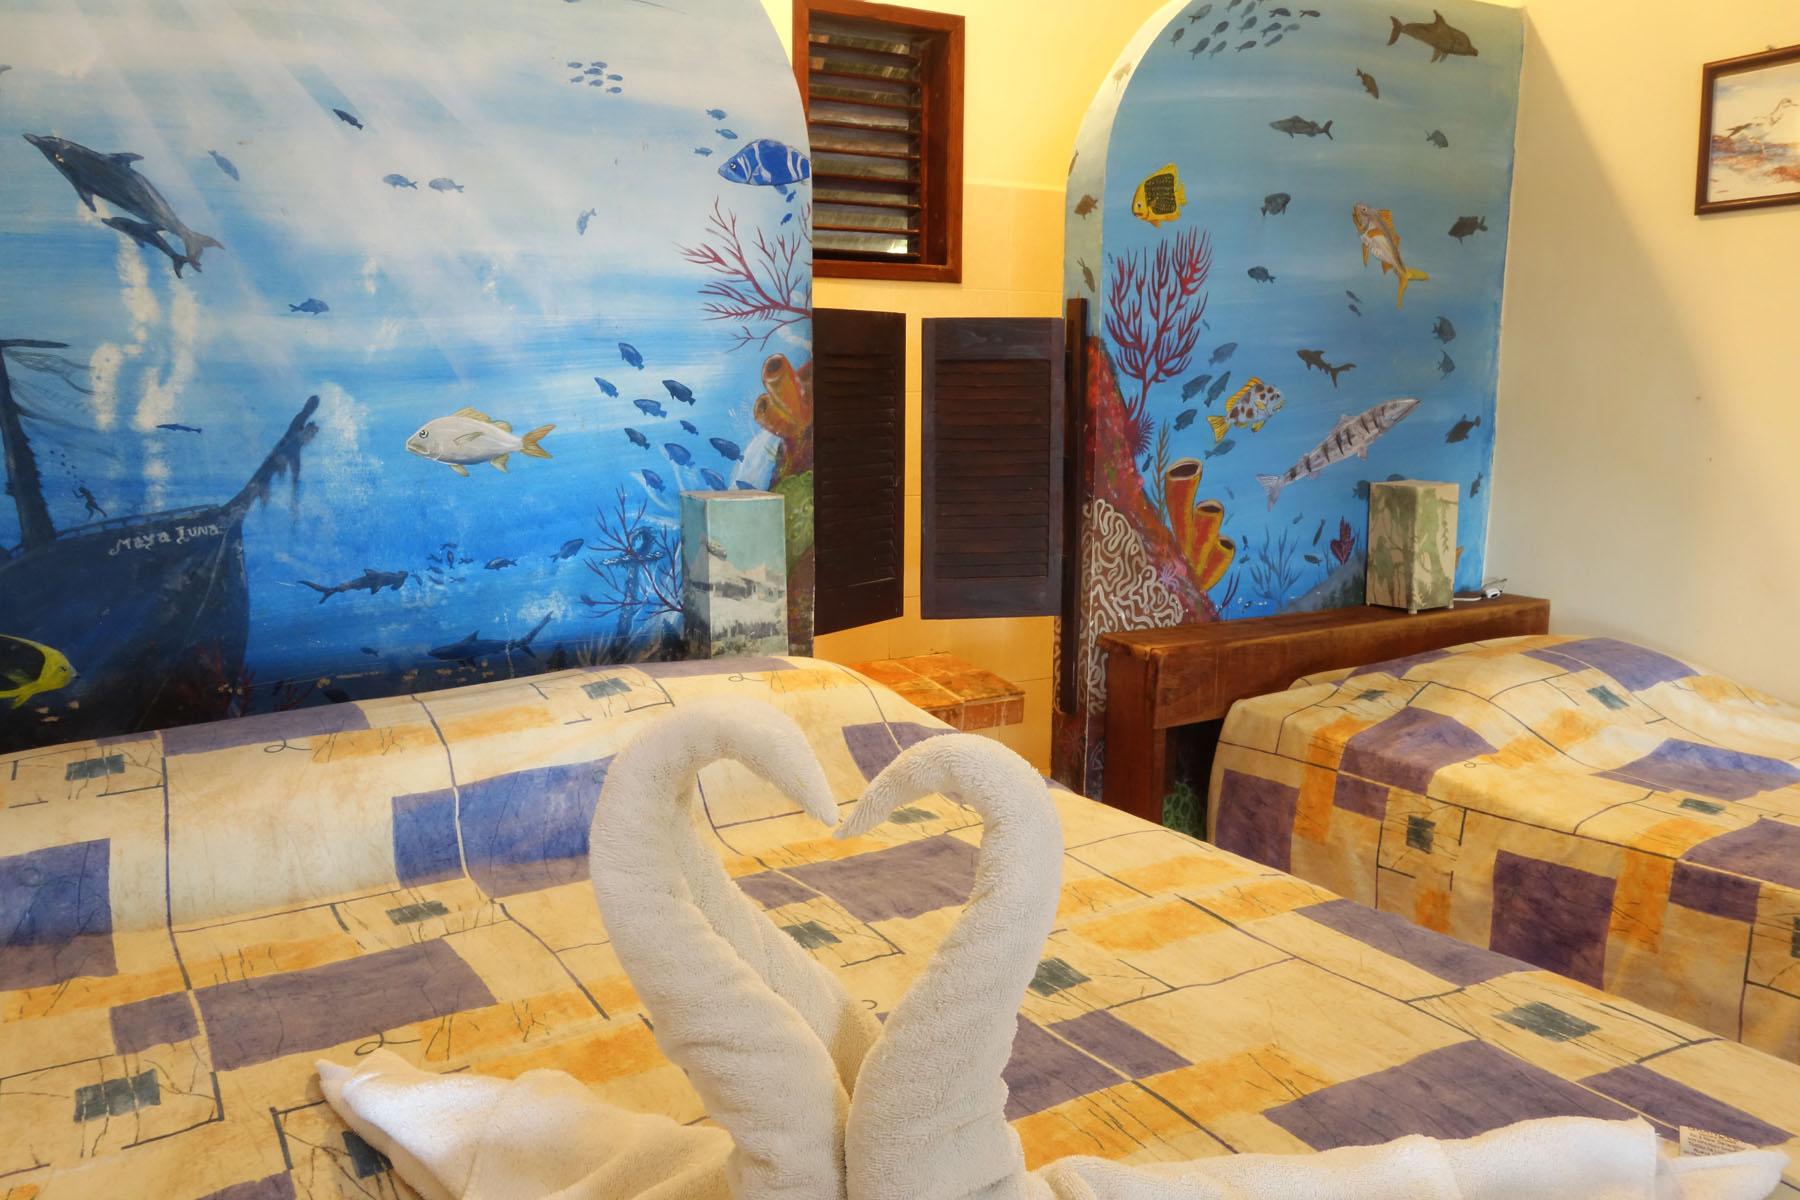 Eco Hotel Restaurant Maya Luna Mahahual. Bungalow Chinchorro 2 beds